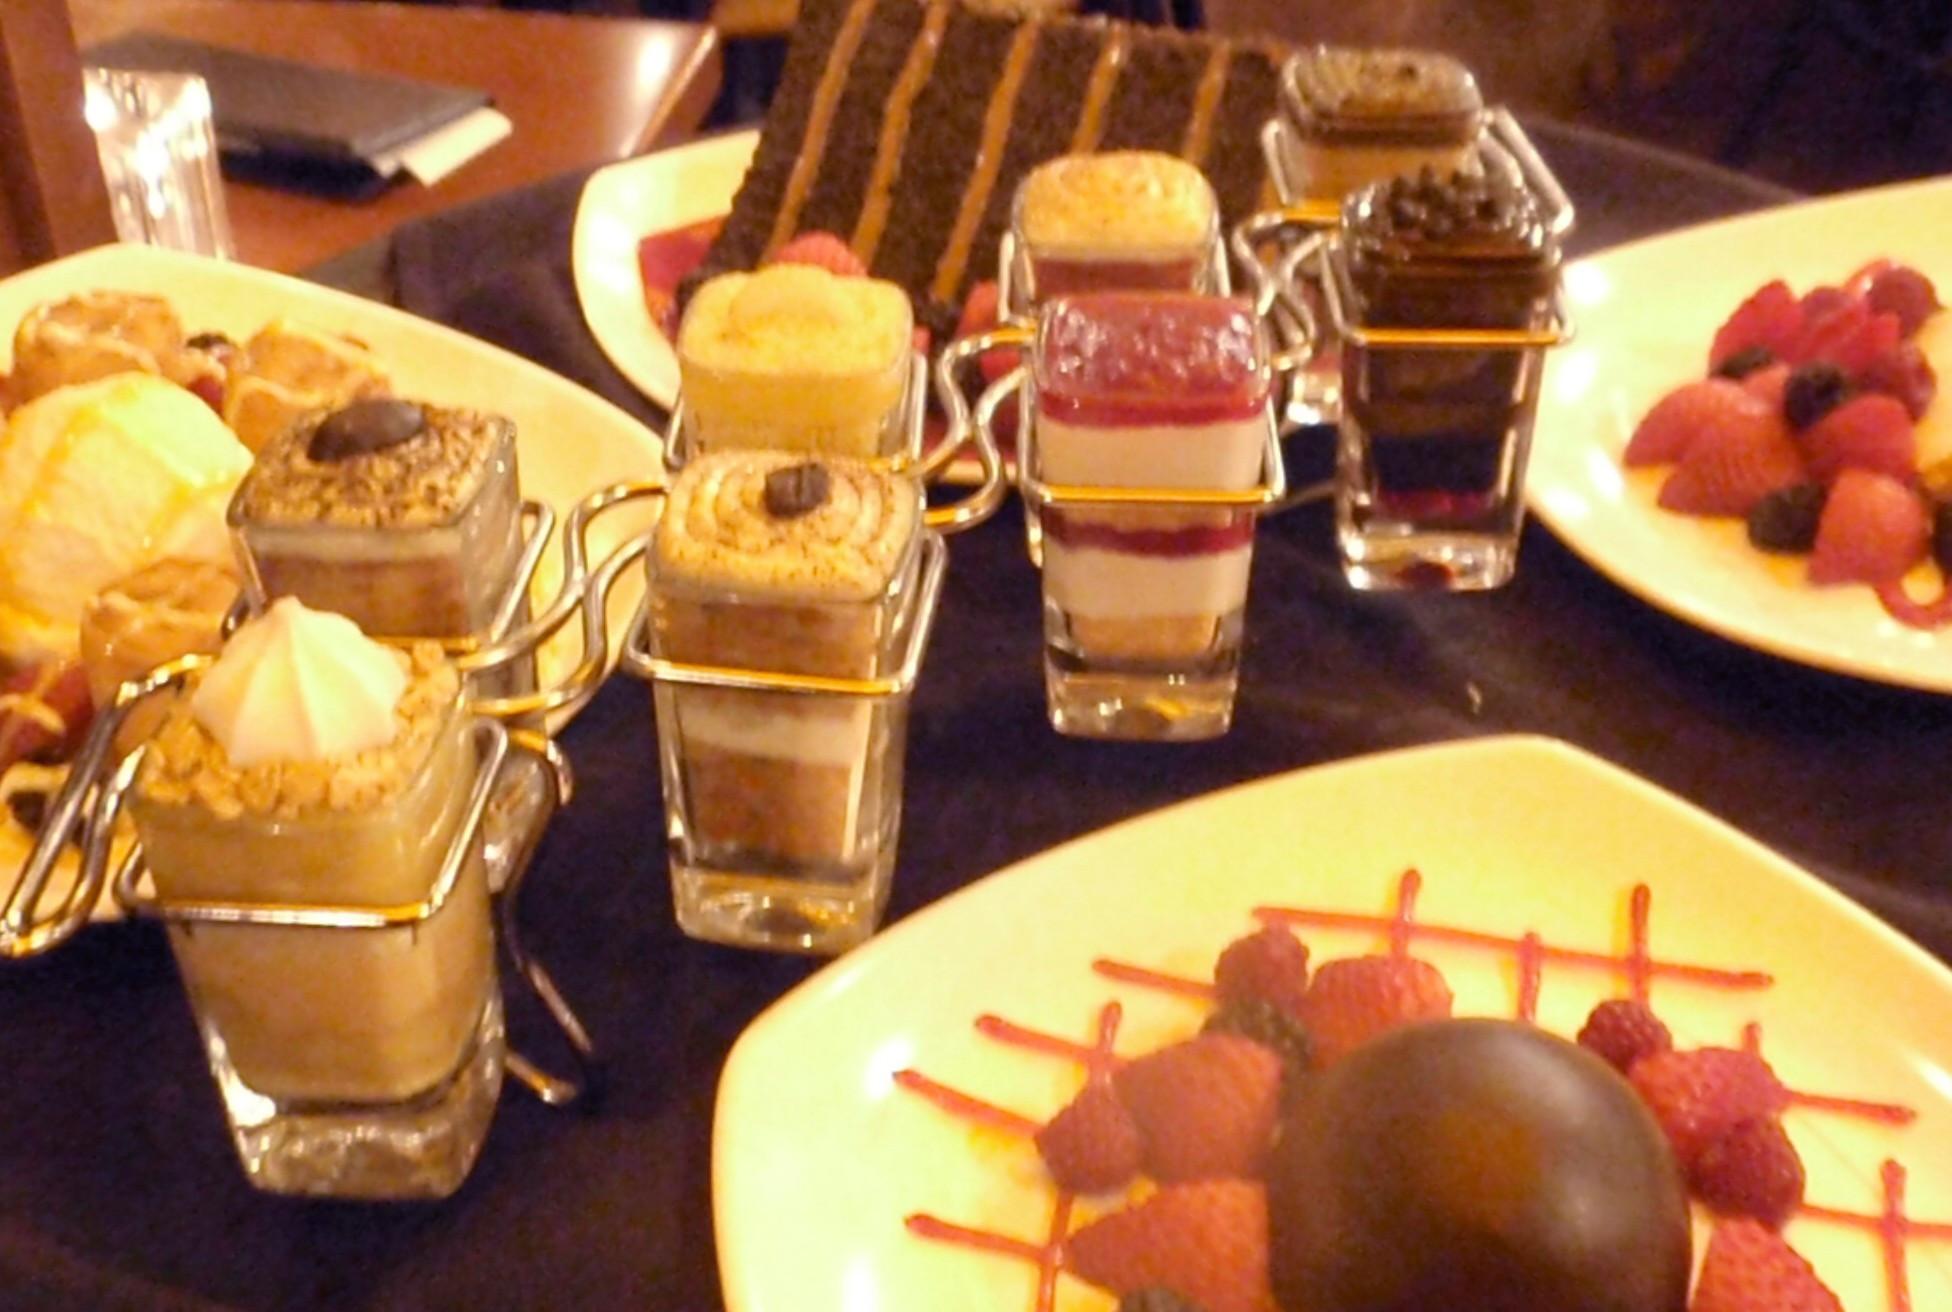 Pf Changs Dessert Menu  P F Chang's China Bistro